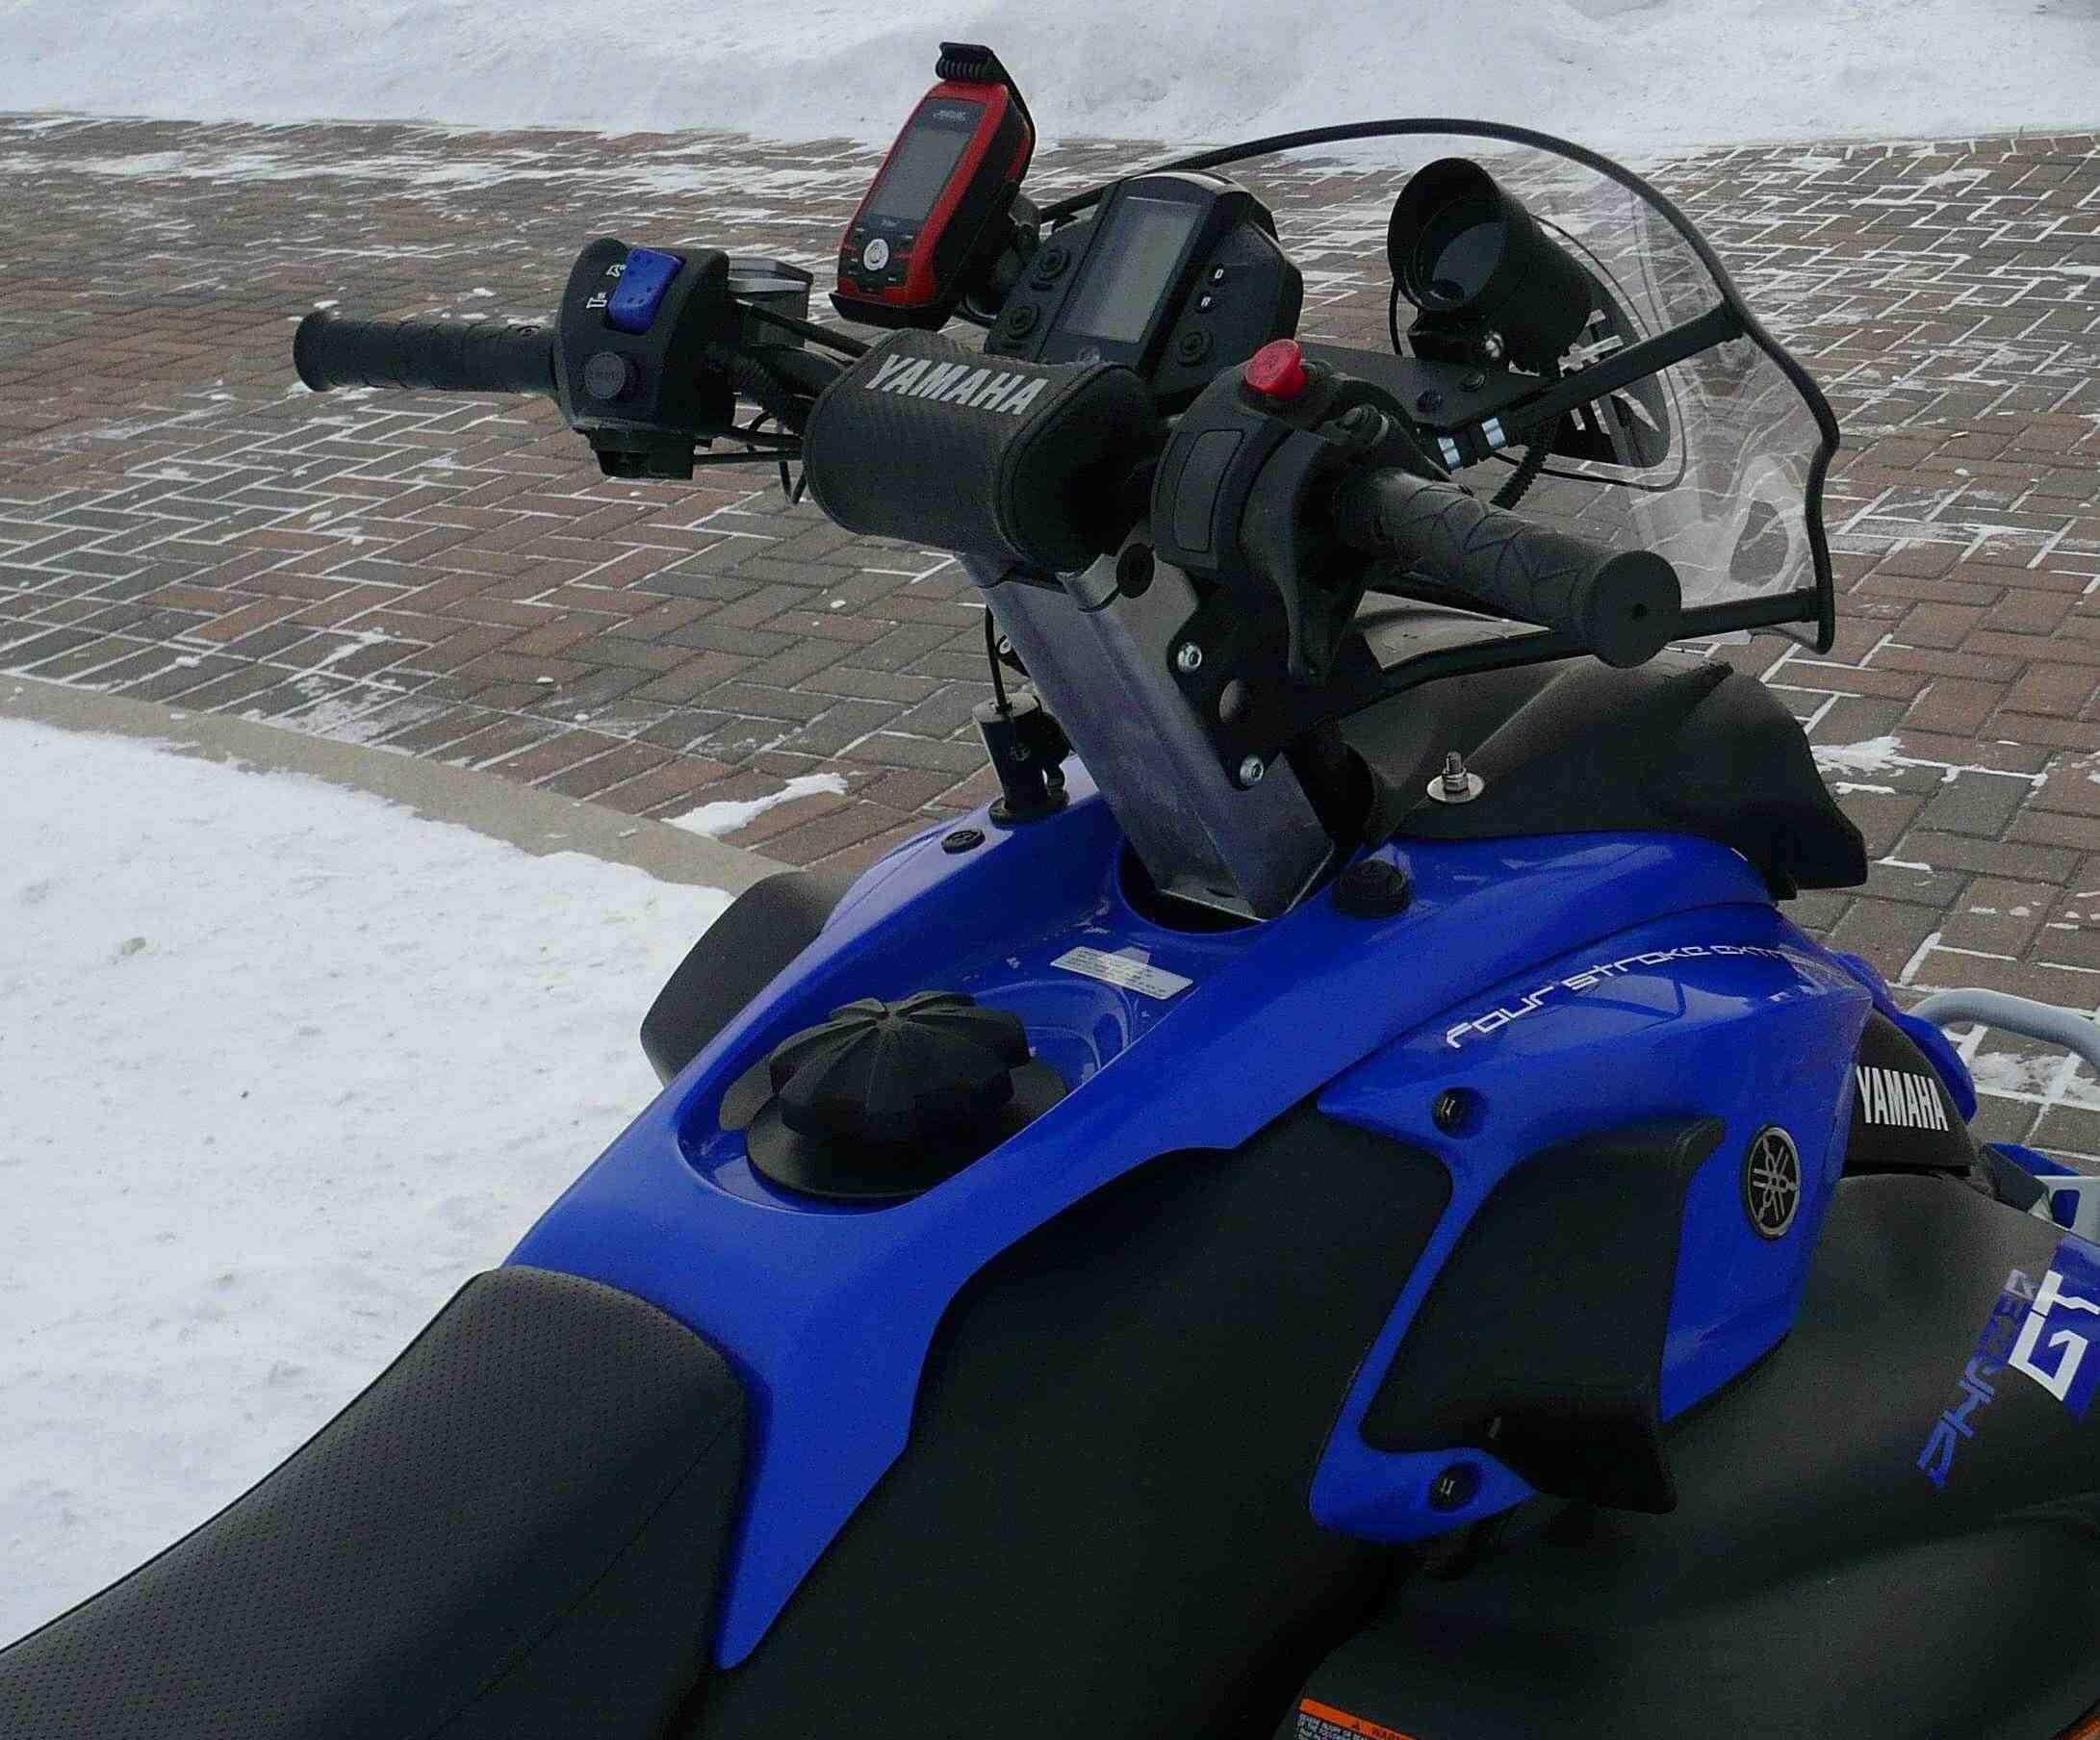 Skidoo Gps And Mount Photos Articles Ski Doo Wiring Diagram 2009 Summit 550f Ram On 2007 Yamaha Phazer